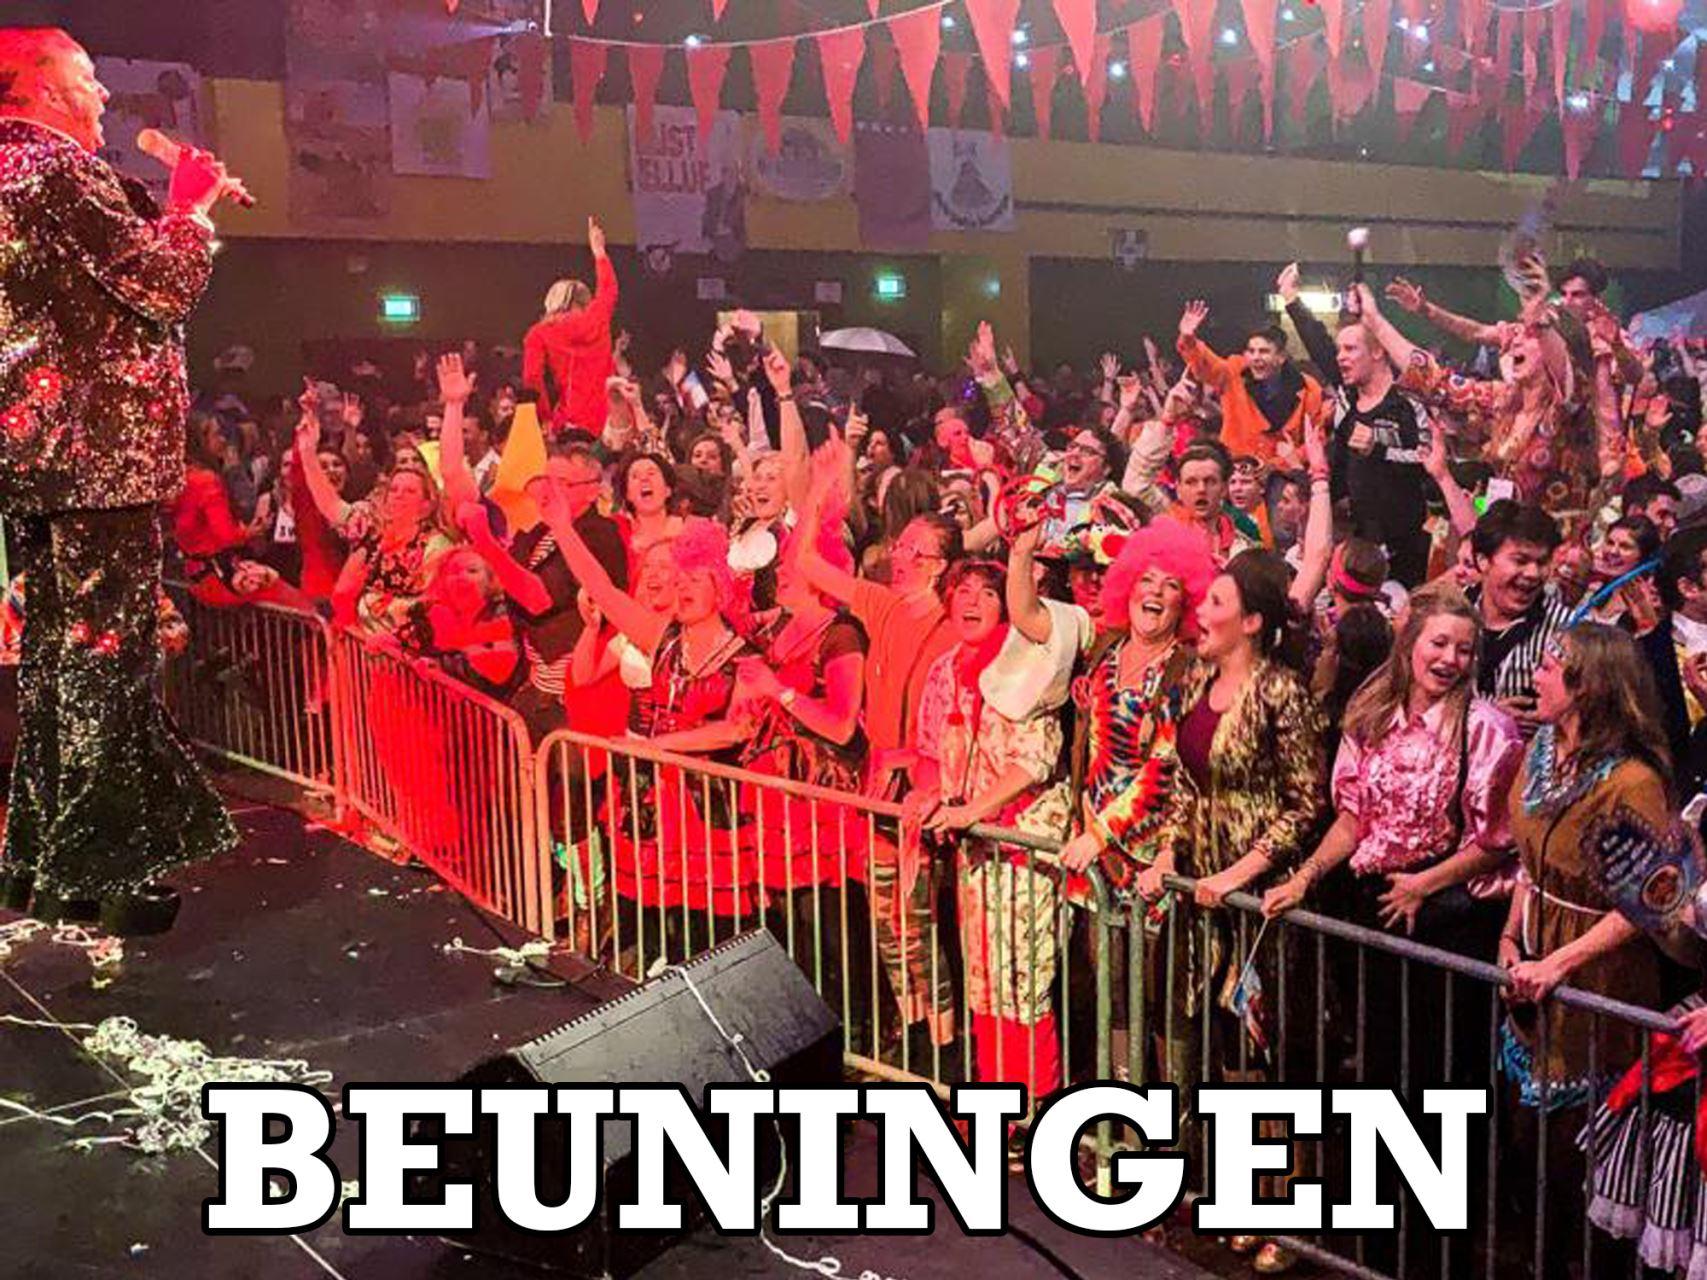 Ronnie_Ruysdael_Beuningen